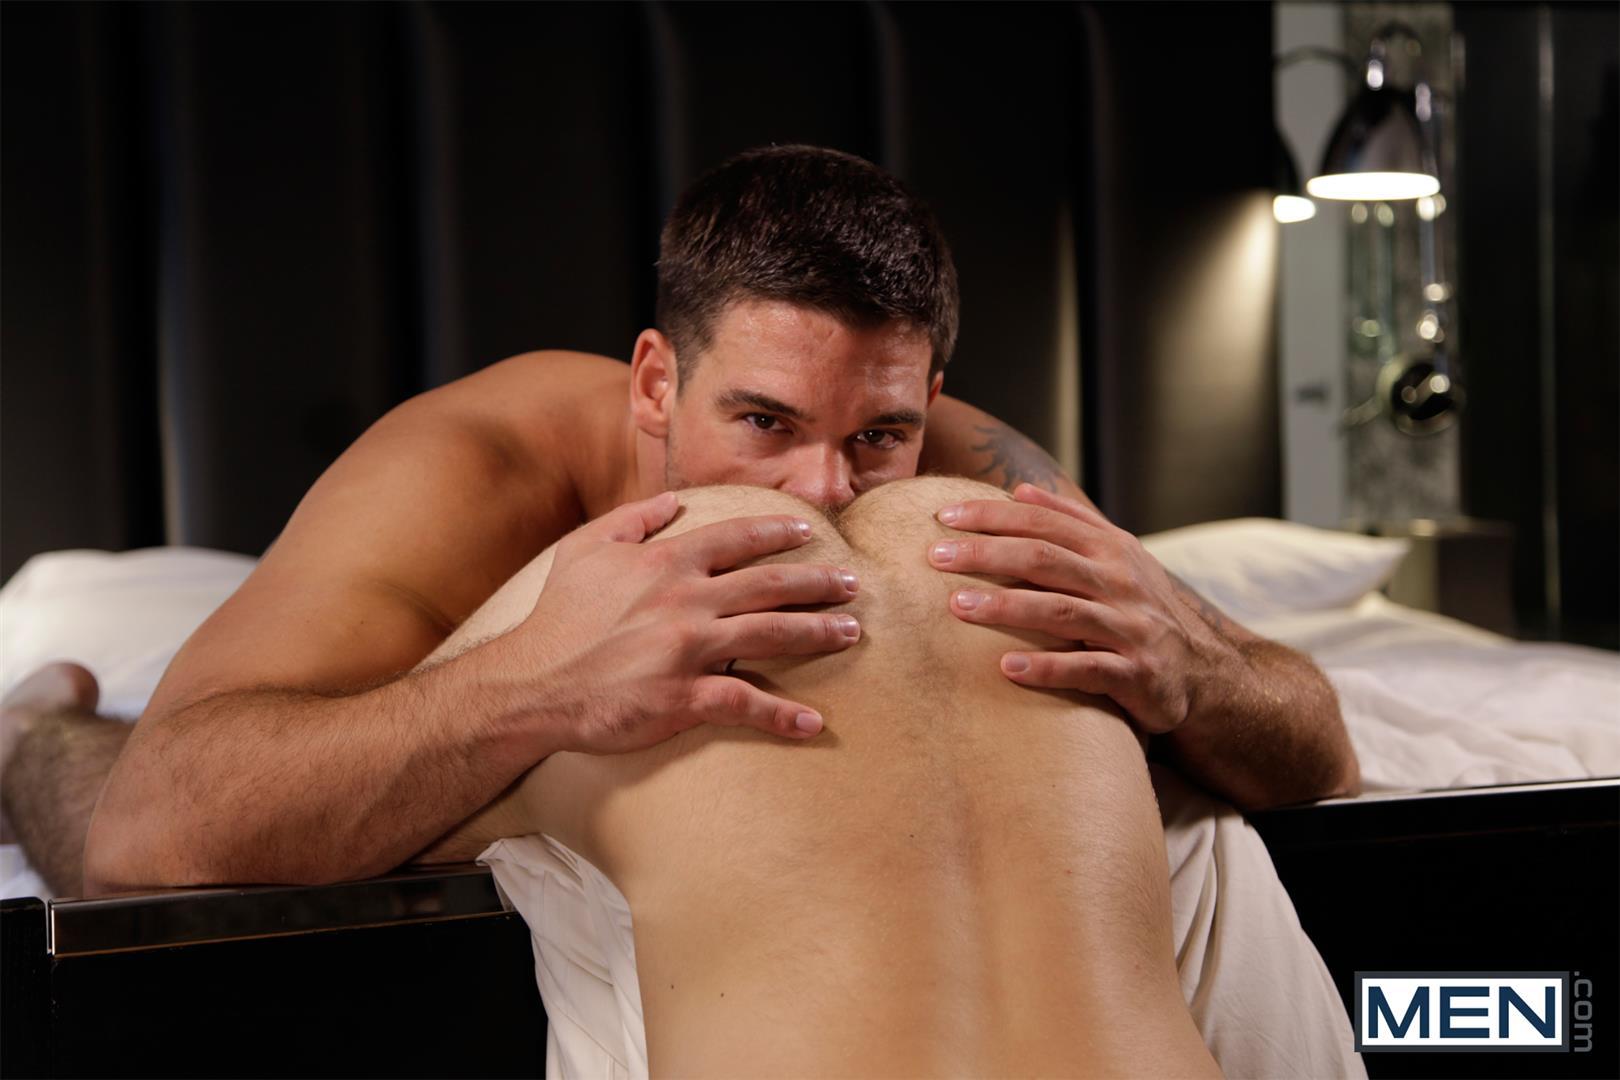 Men-Derek-Atlas-and-Jimmy-Fanz-Hairy-Muscle-Hunks-Big-Cocks-Fucking-Amateur-Gay-Porn-13 Hairy Muscle Hunk Derek Atlas Bottoms For Big Cock Jimmy Fanz